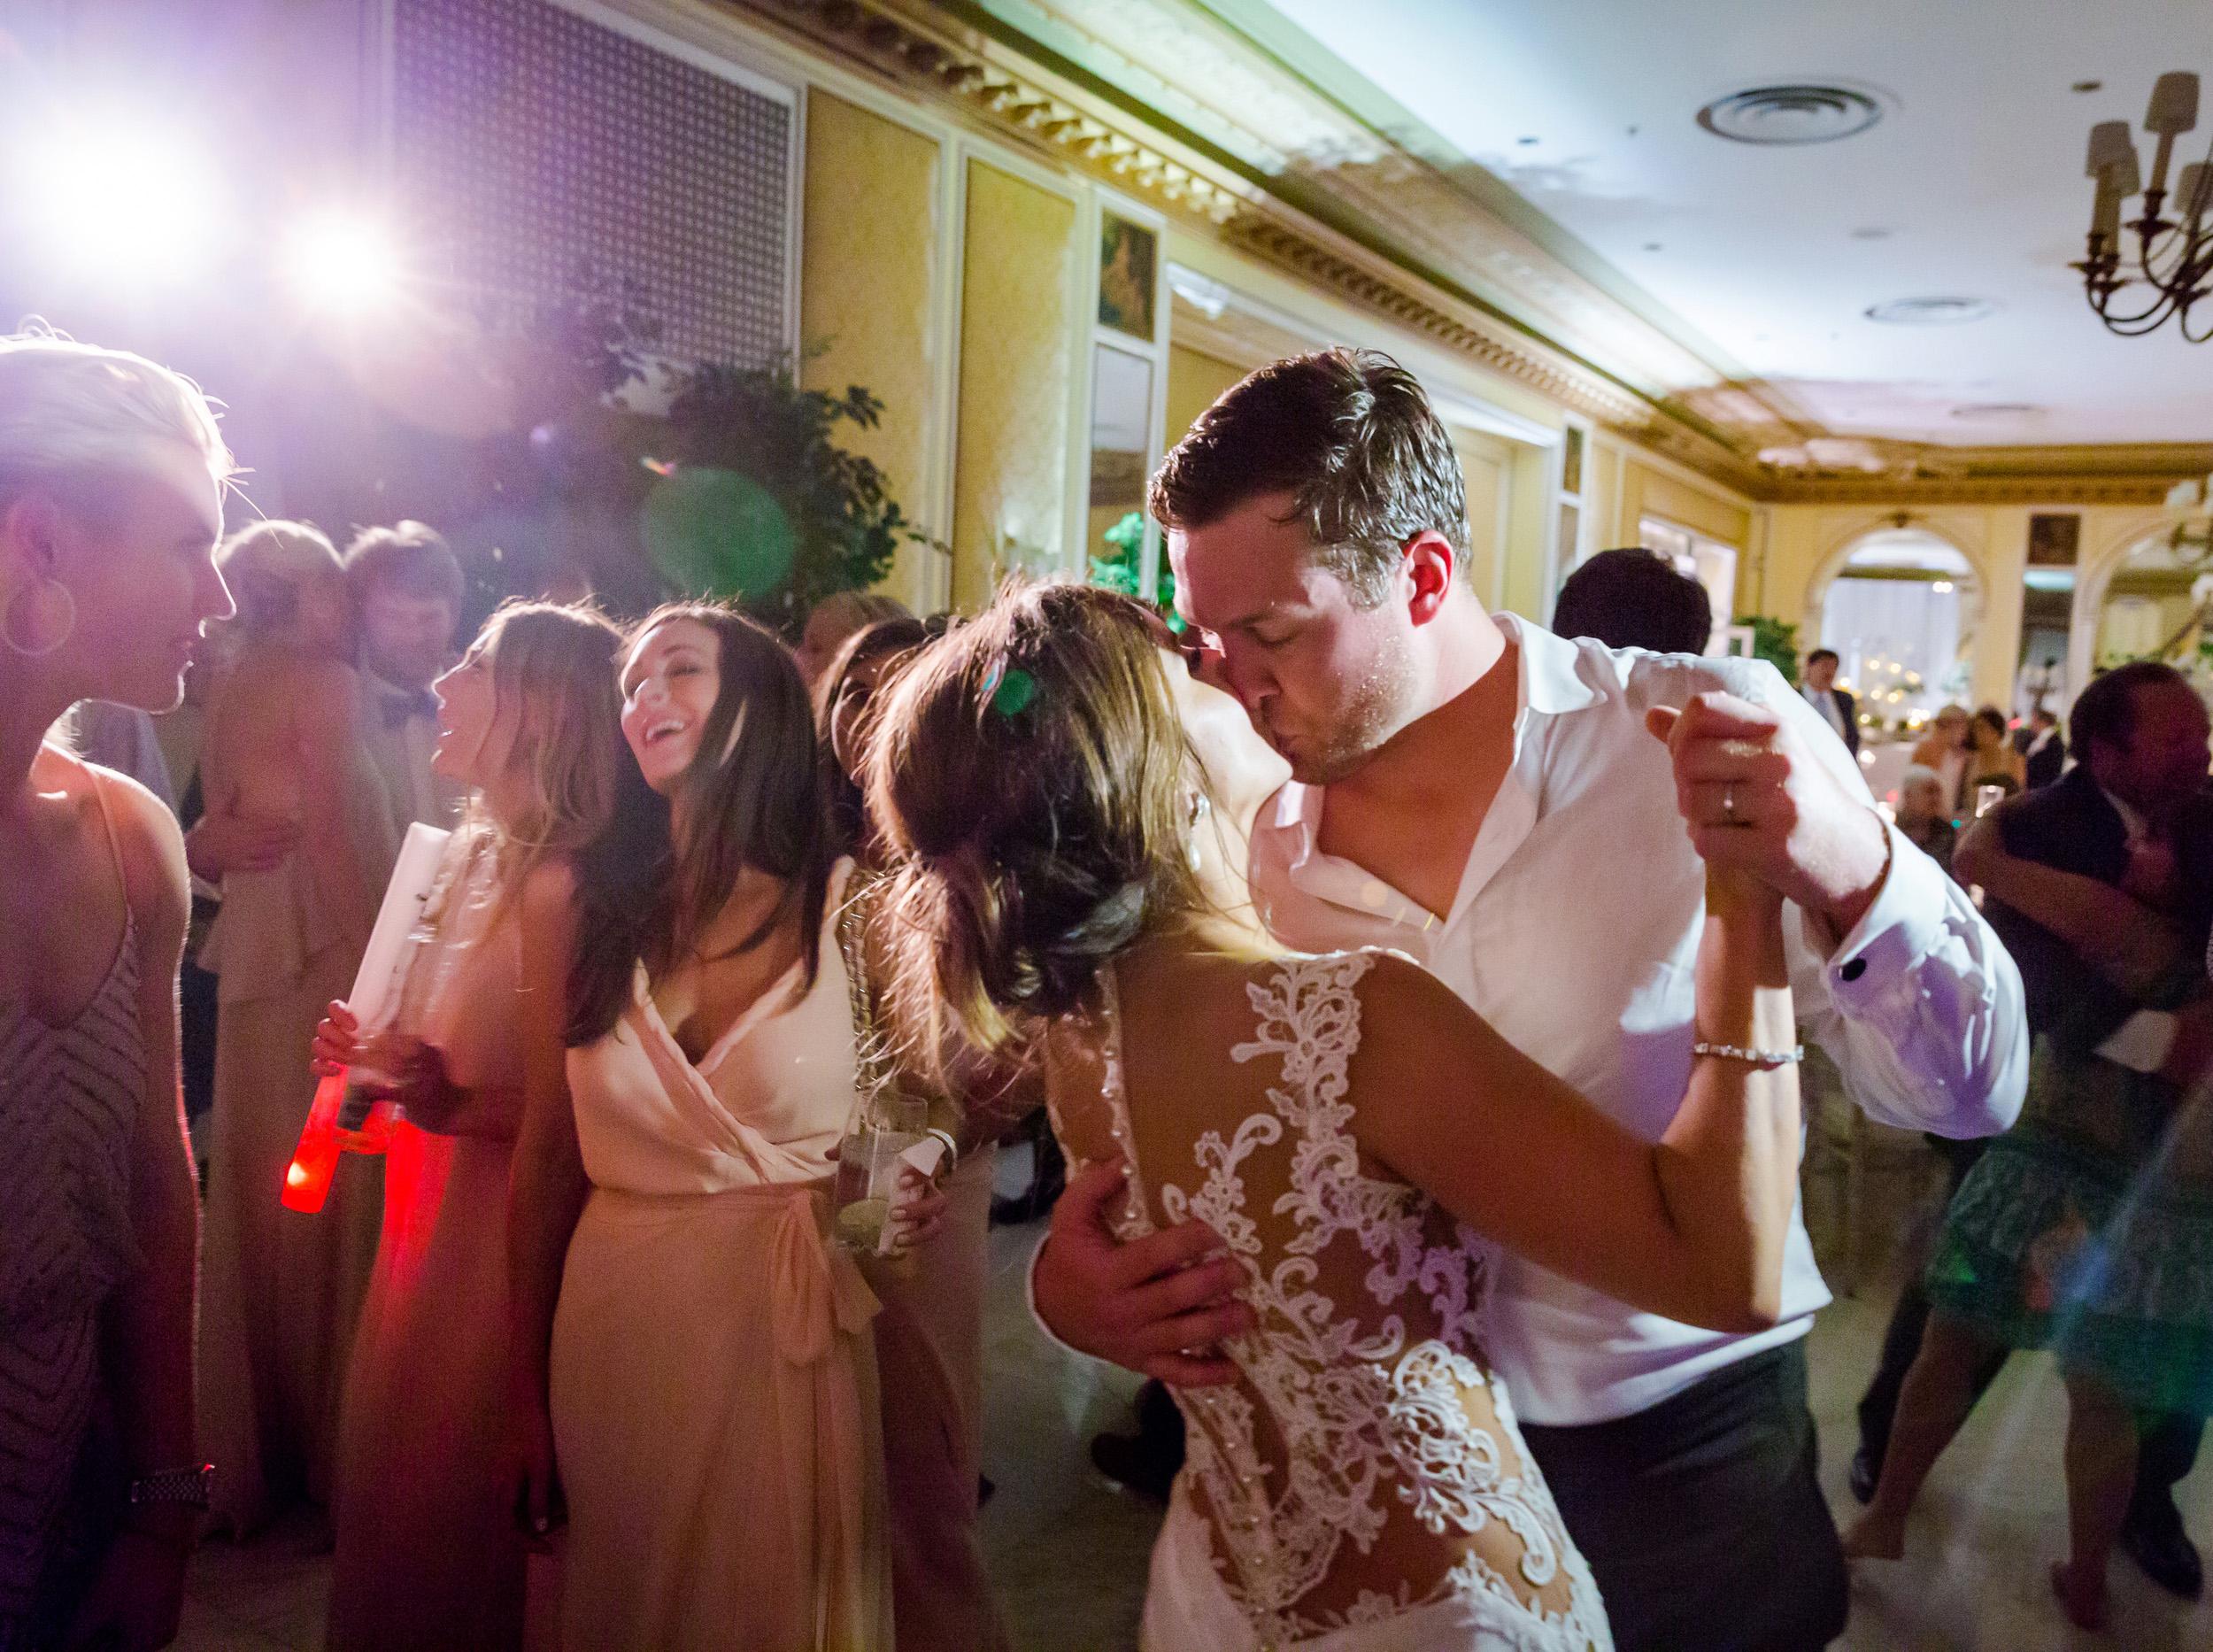 Colorado-Springs-Wedding-Photography-SS-011.jpg